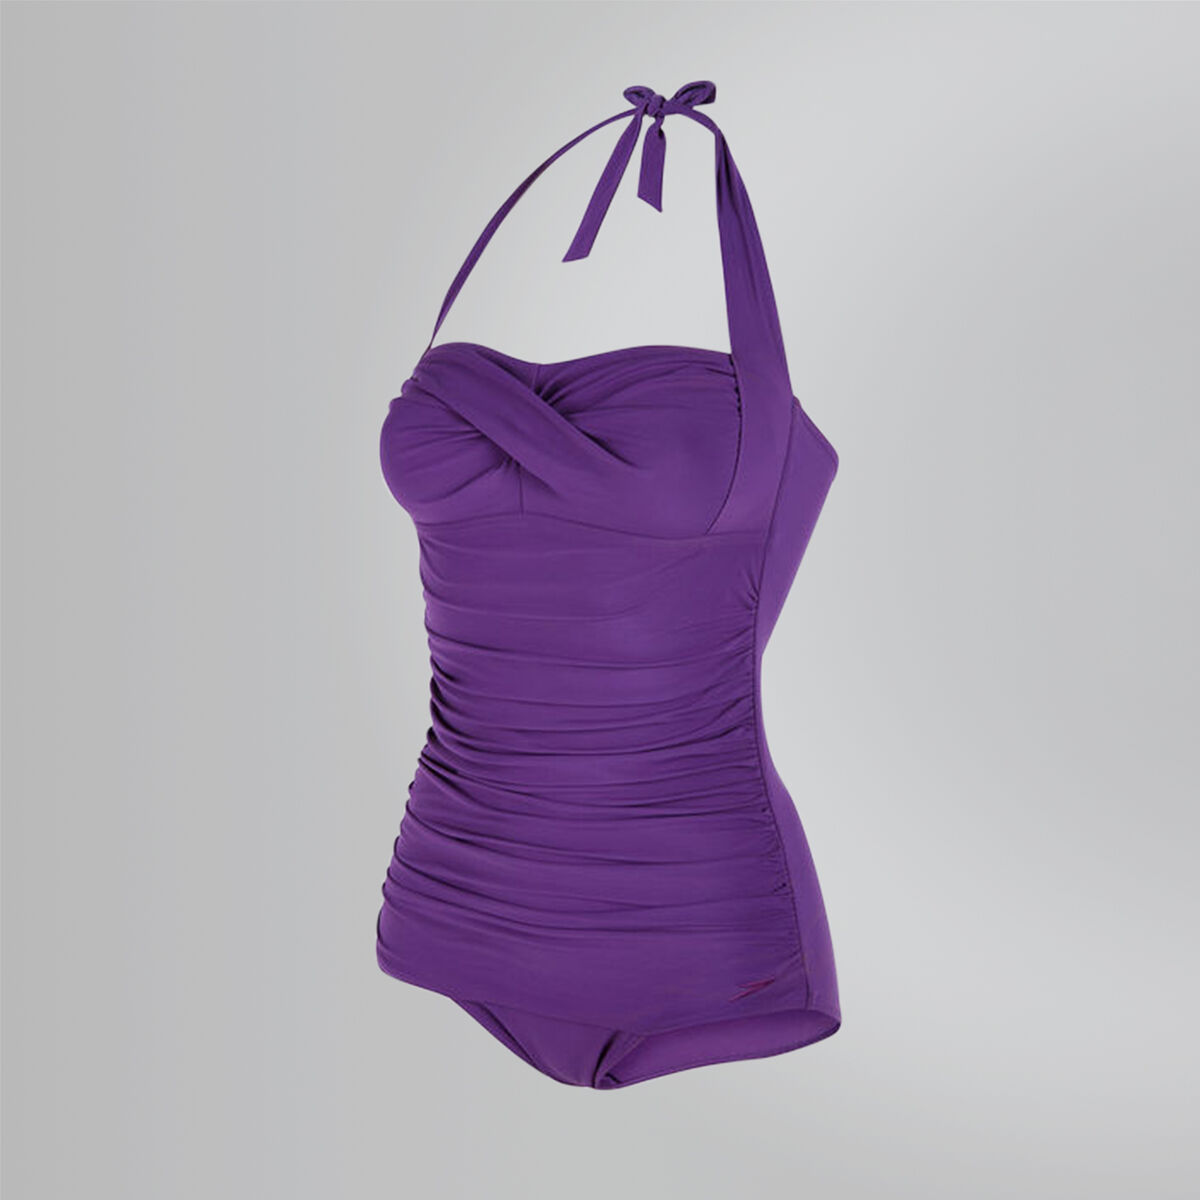 Sculpture Crystalsun Swimsuit